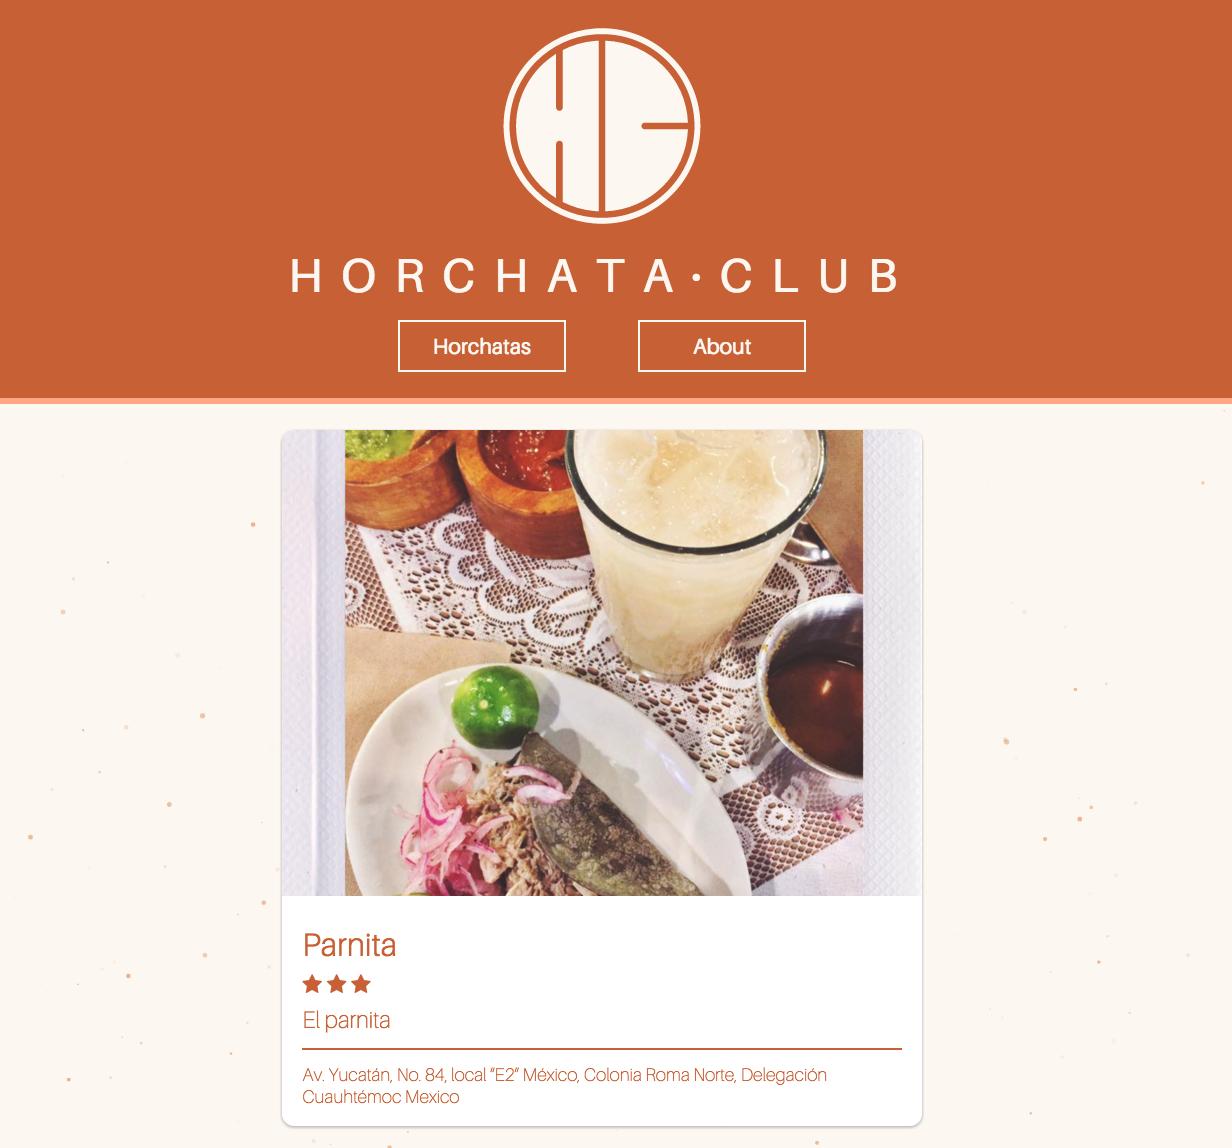 Horchata.club